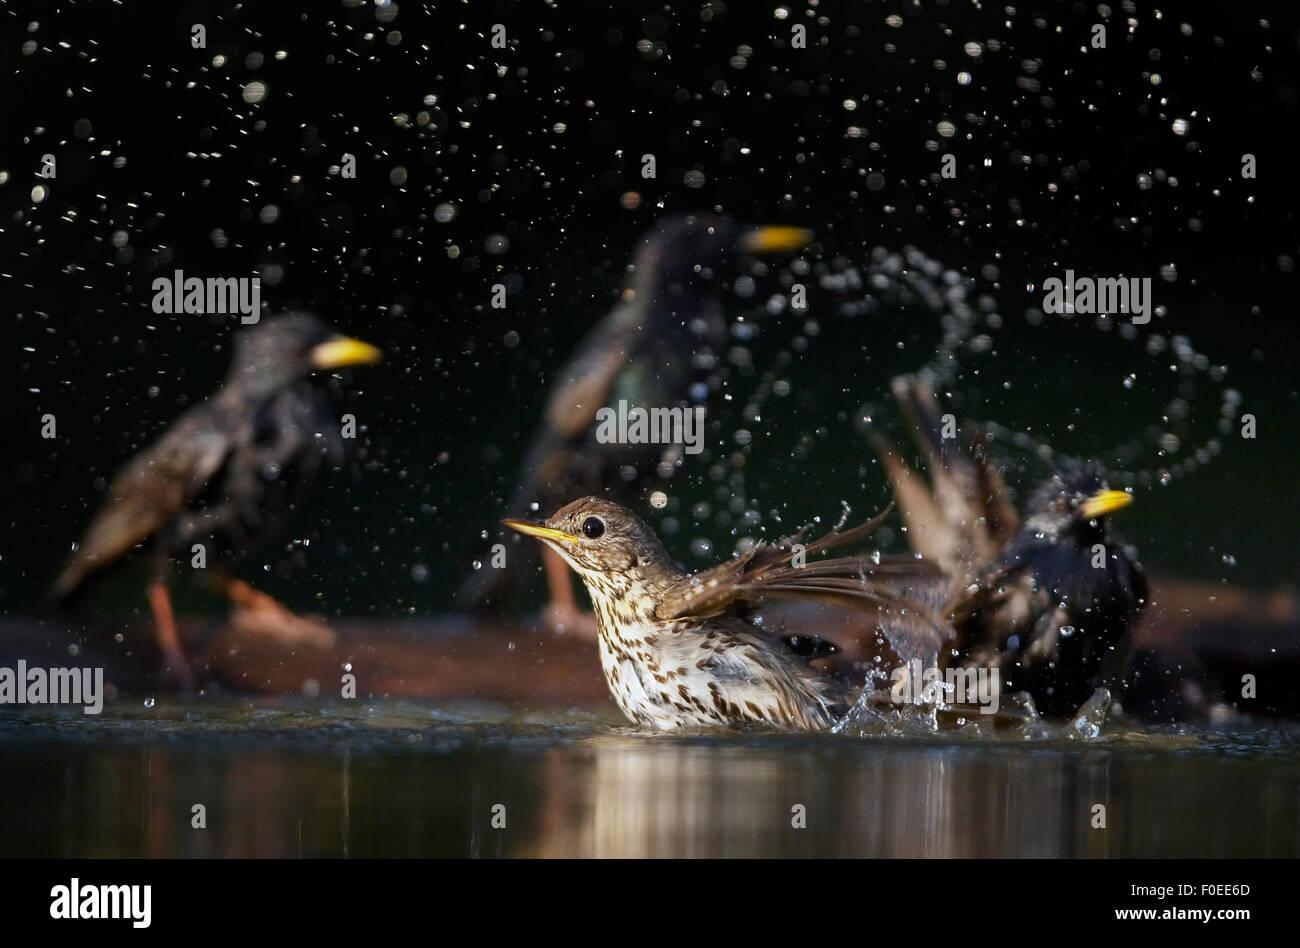 Song Thrush (Turdus philomelos) bathing with Common starling {Sturnus vulgaris} behind, Pusztaszer, Hungary, May - Stock Image